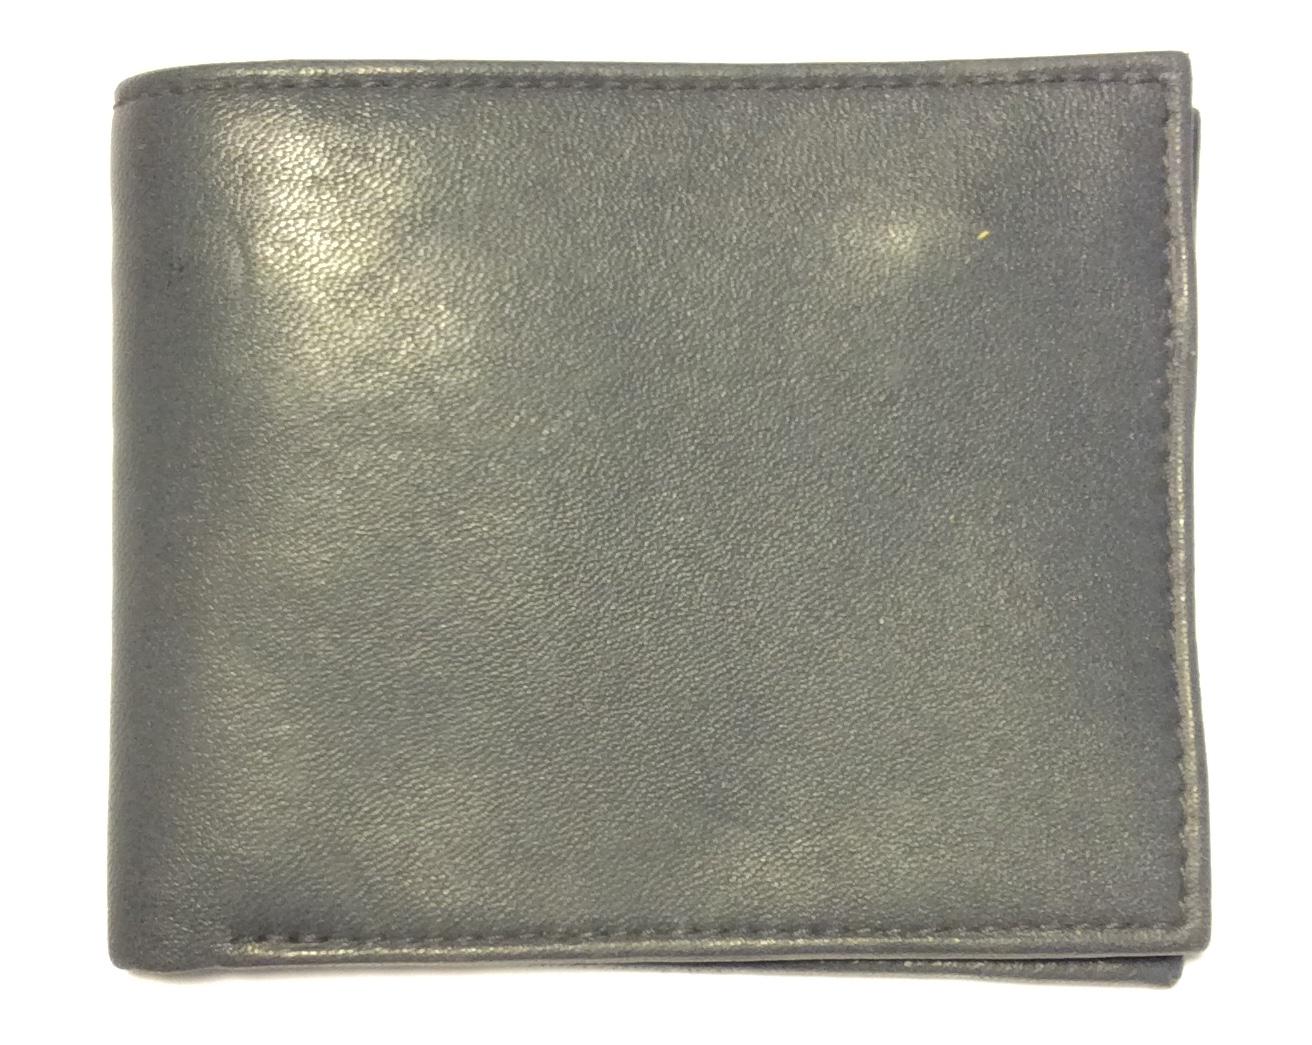 Buxton Grey leather bifold